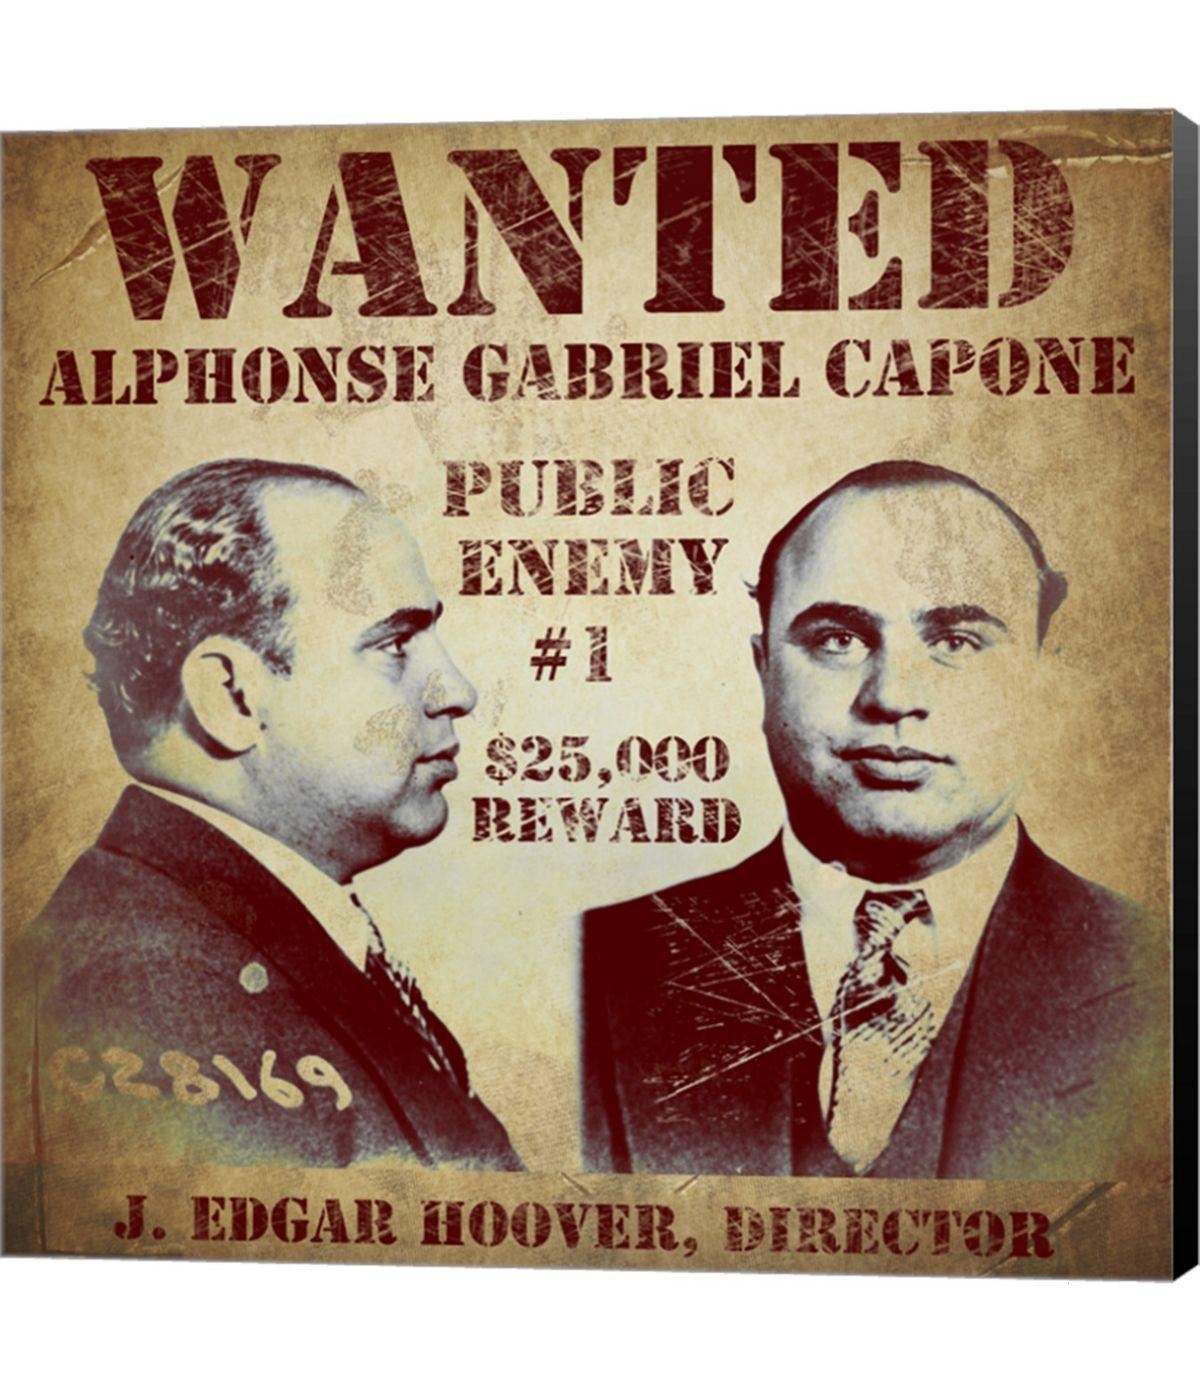 Al Capone Wanted Poster By Vintage Apple Collection Canvas Art Multi Al Capone Vintage Apple Posters Art Prints